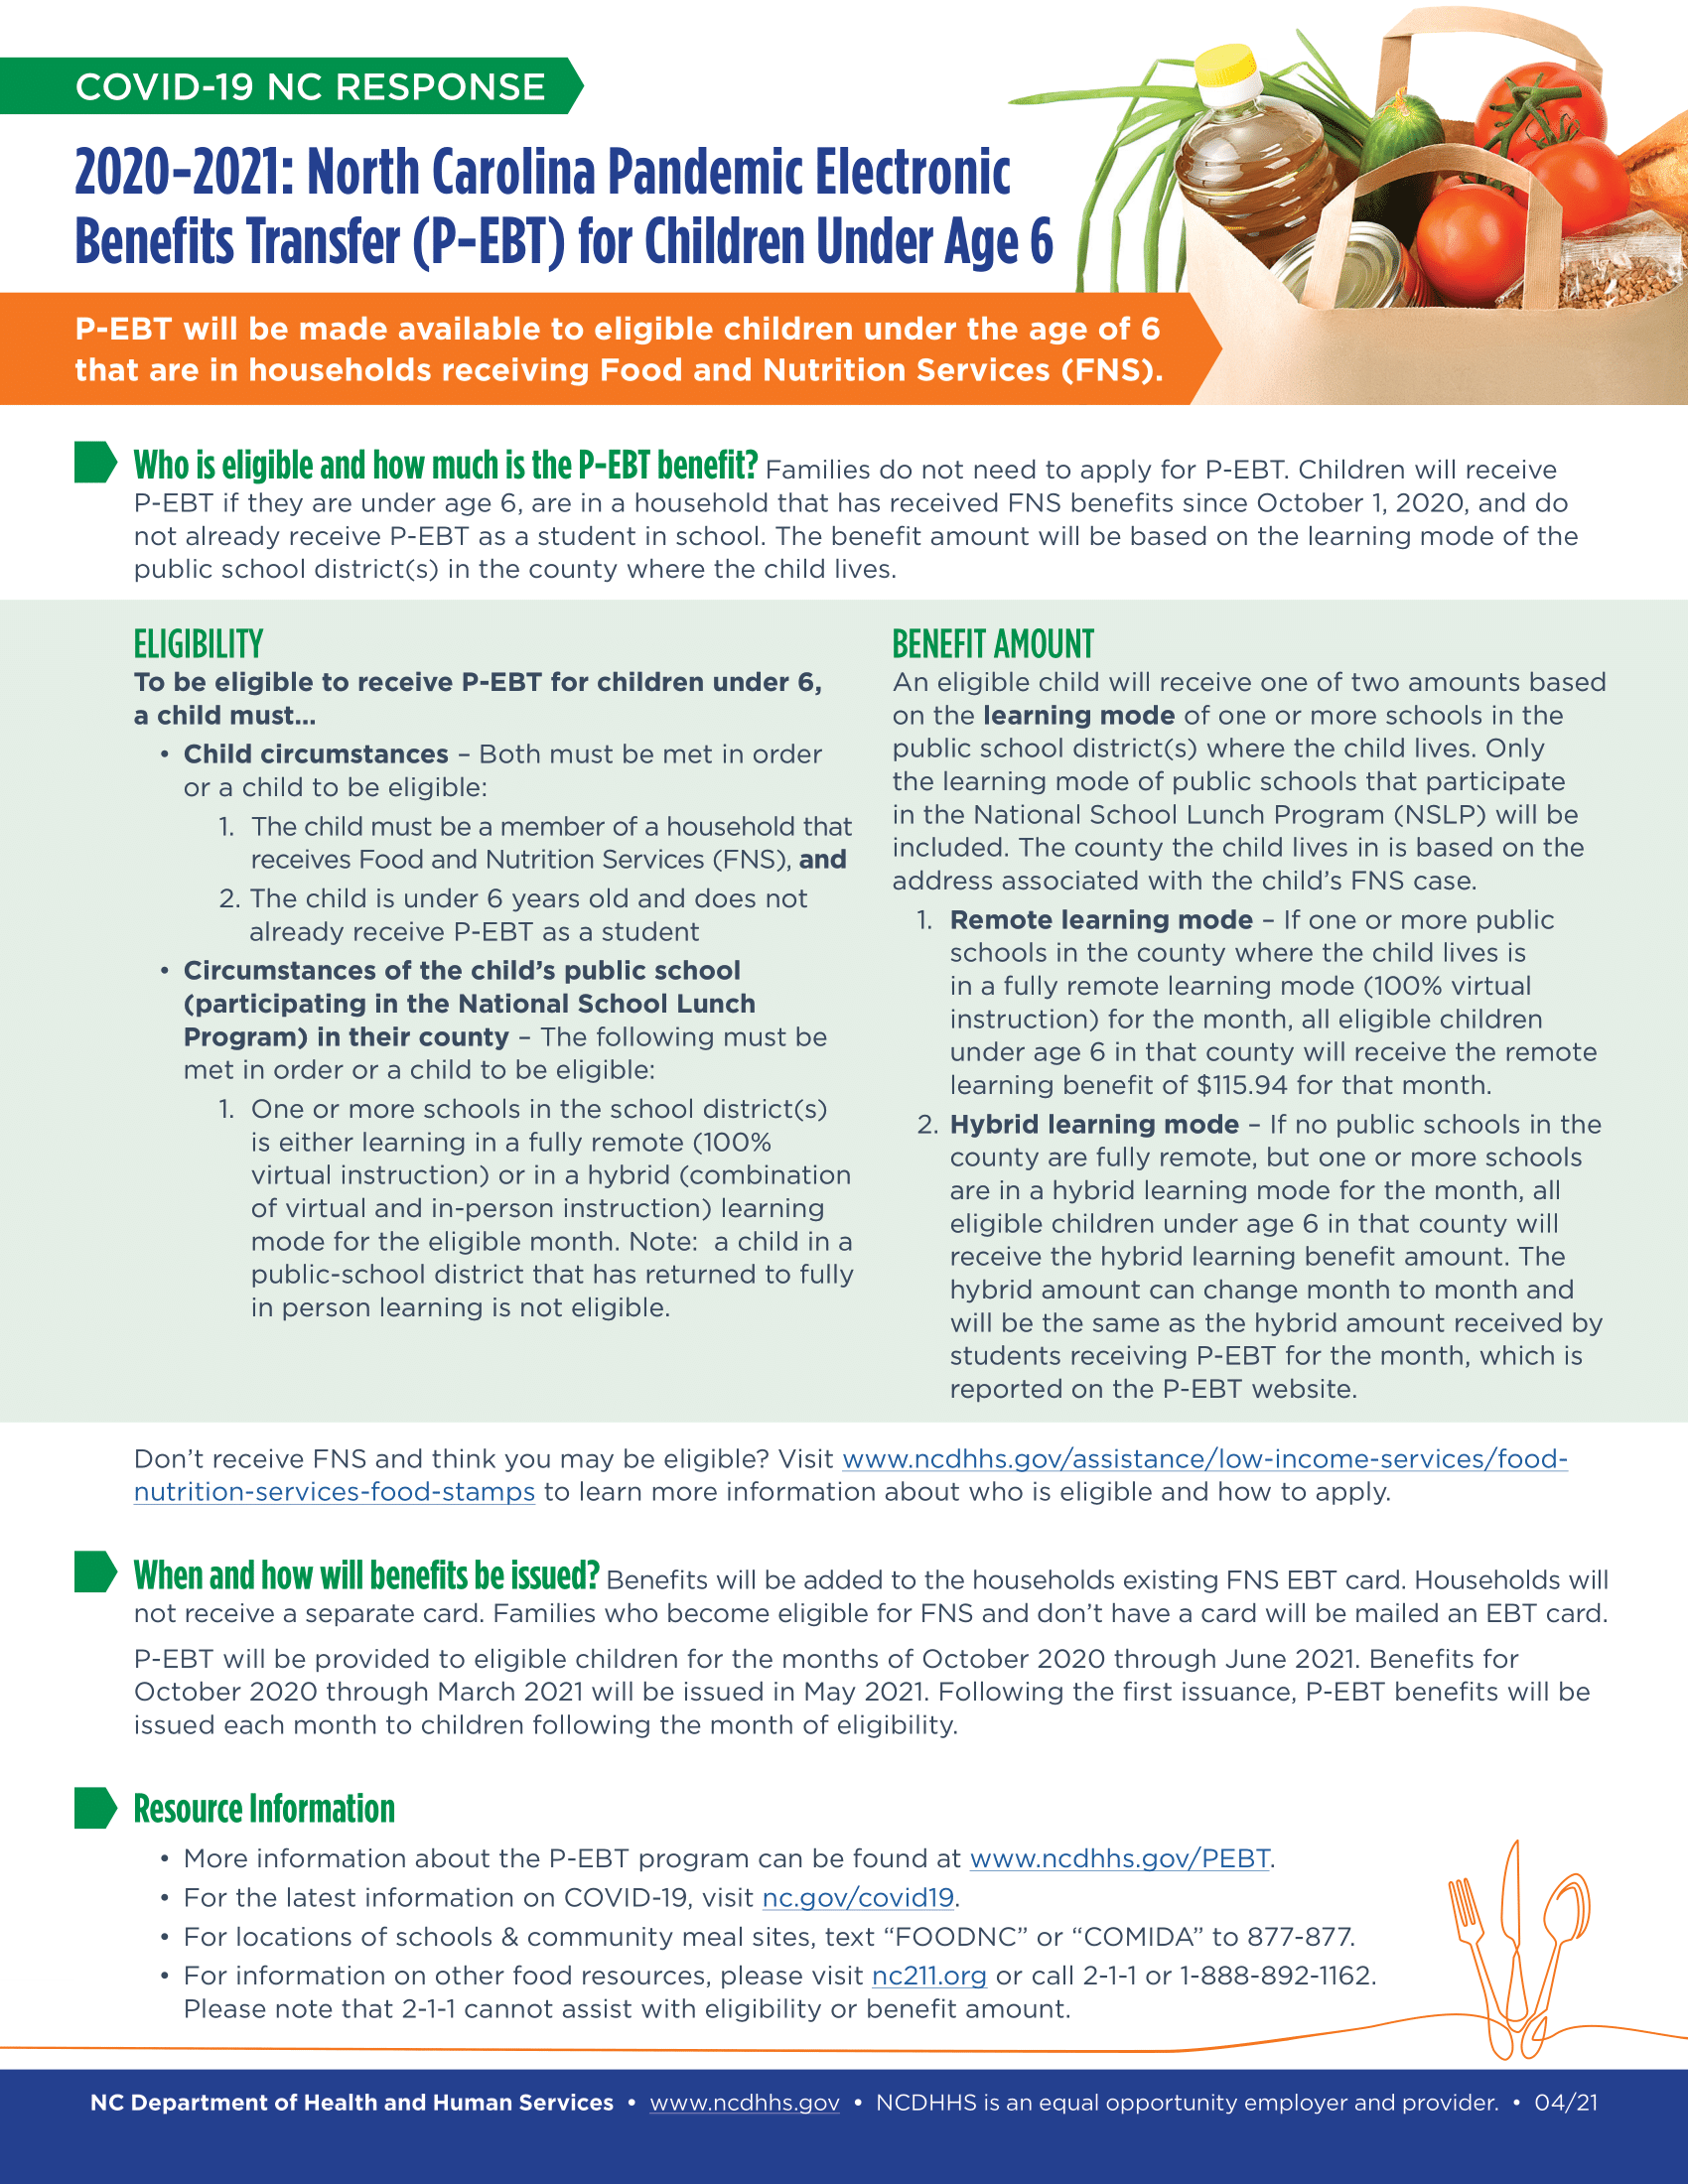 P-EBT Benefits flyer image